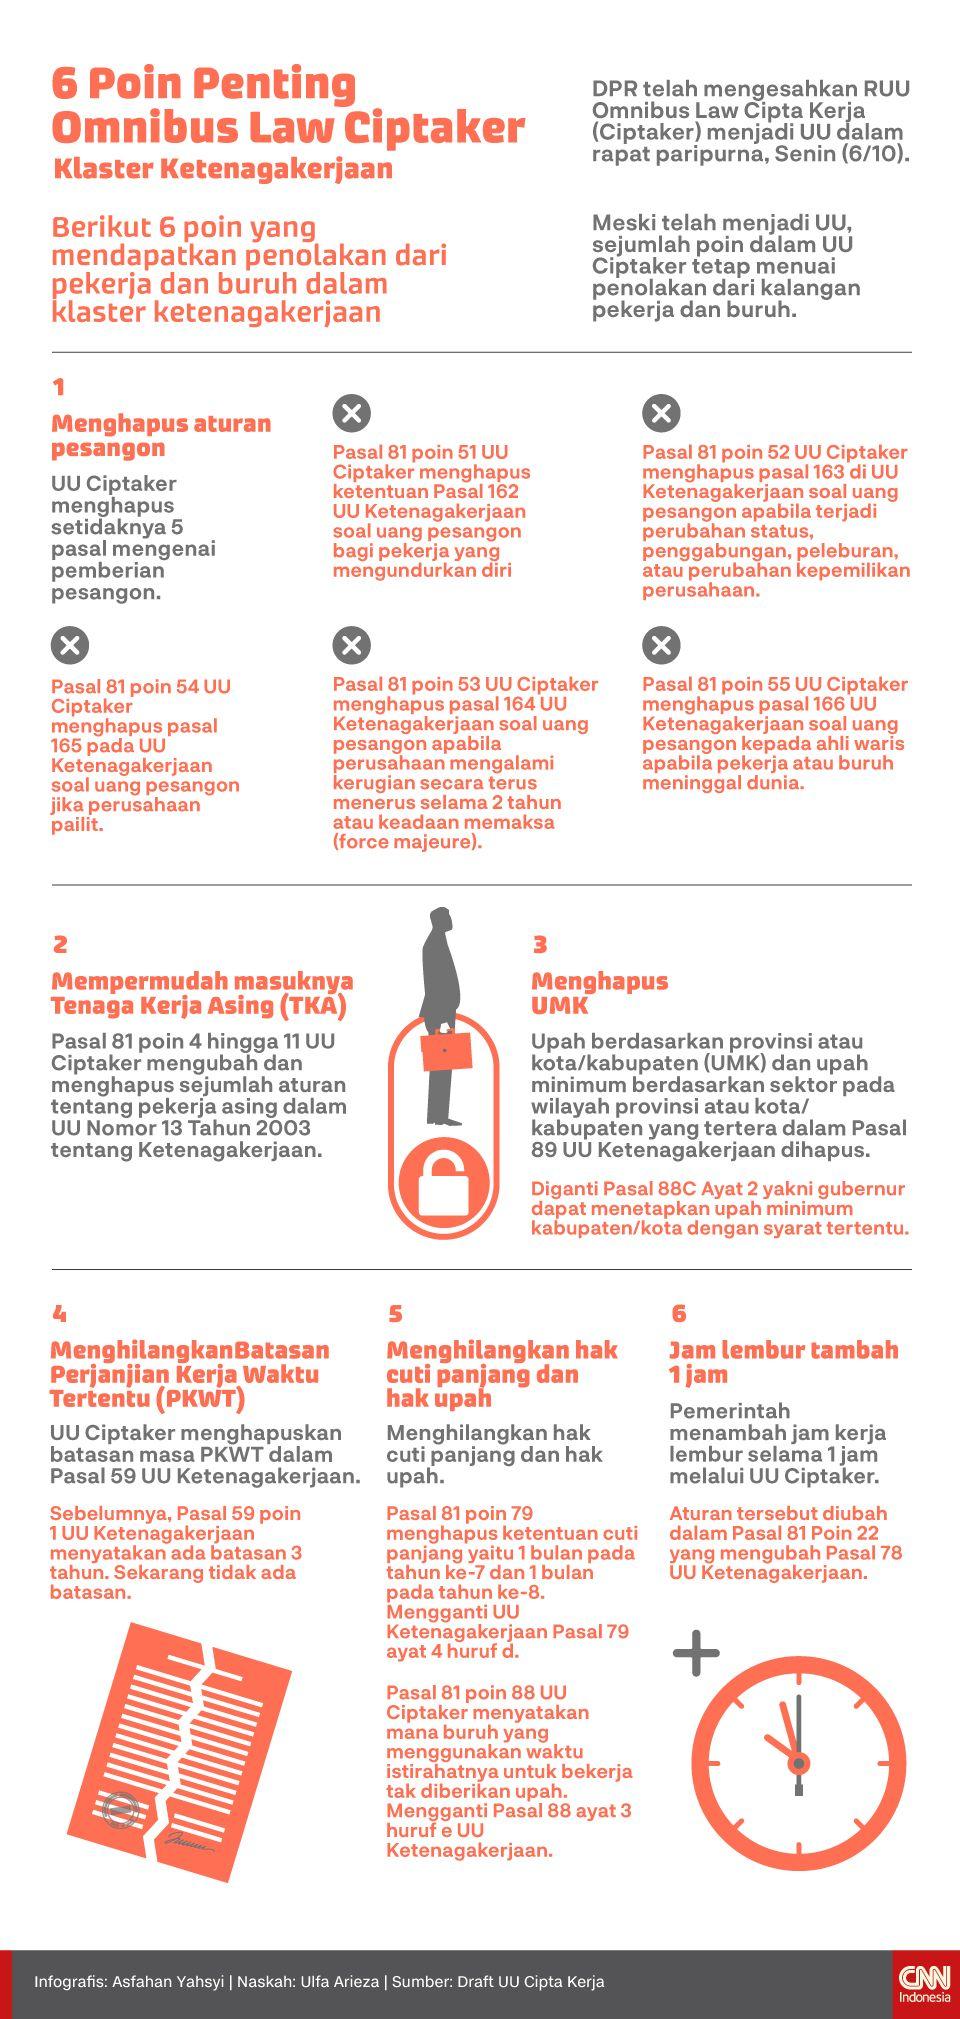 Infografis 6 Poin Penting Omnibus Law Ciptaker Klaster Ketenagakerjaan